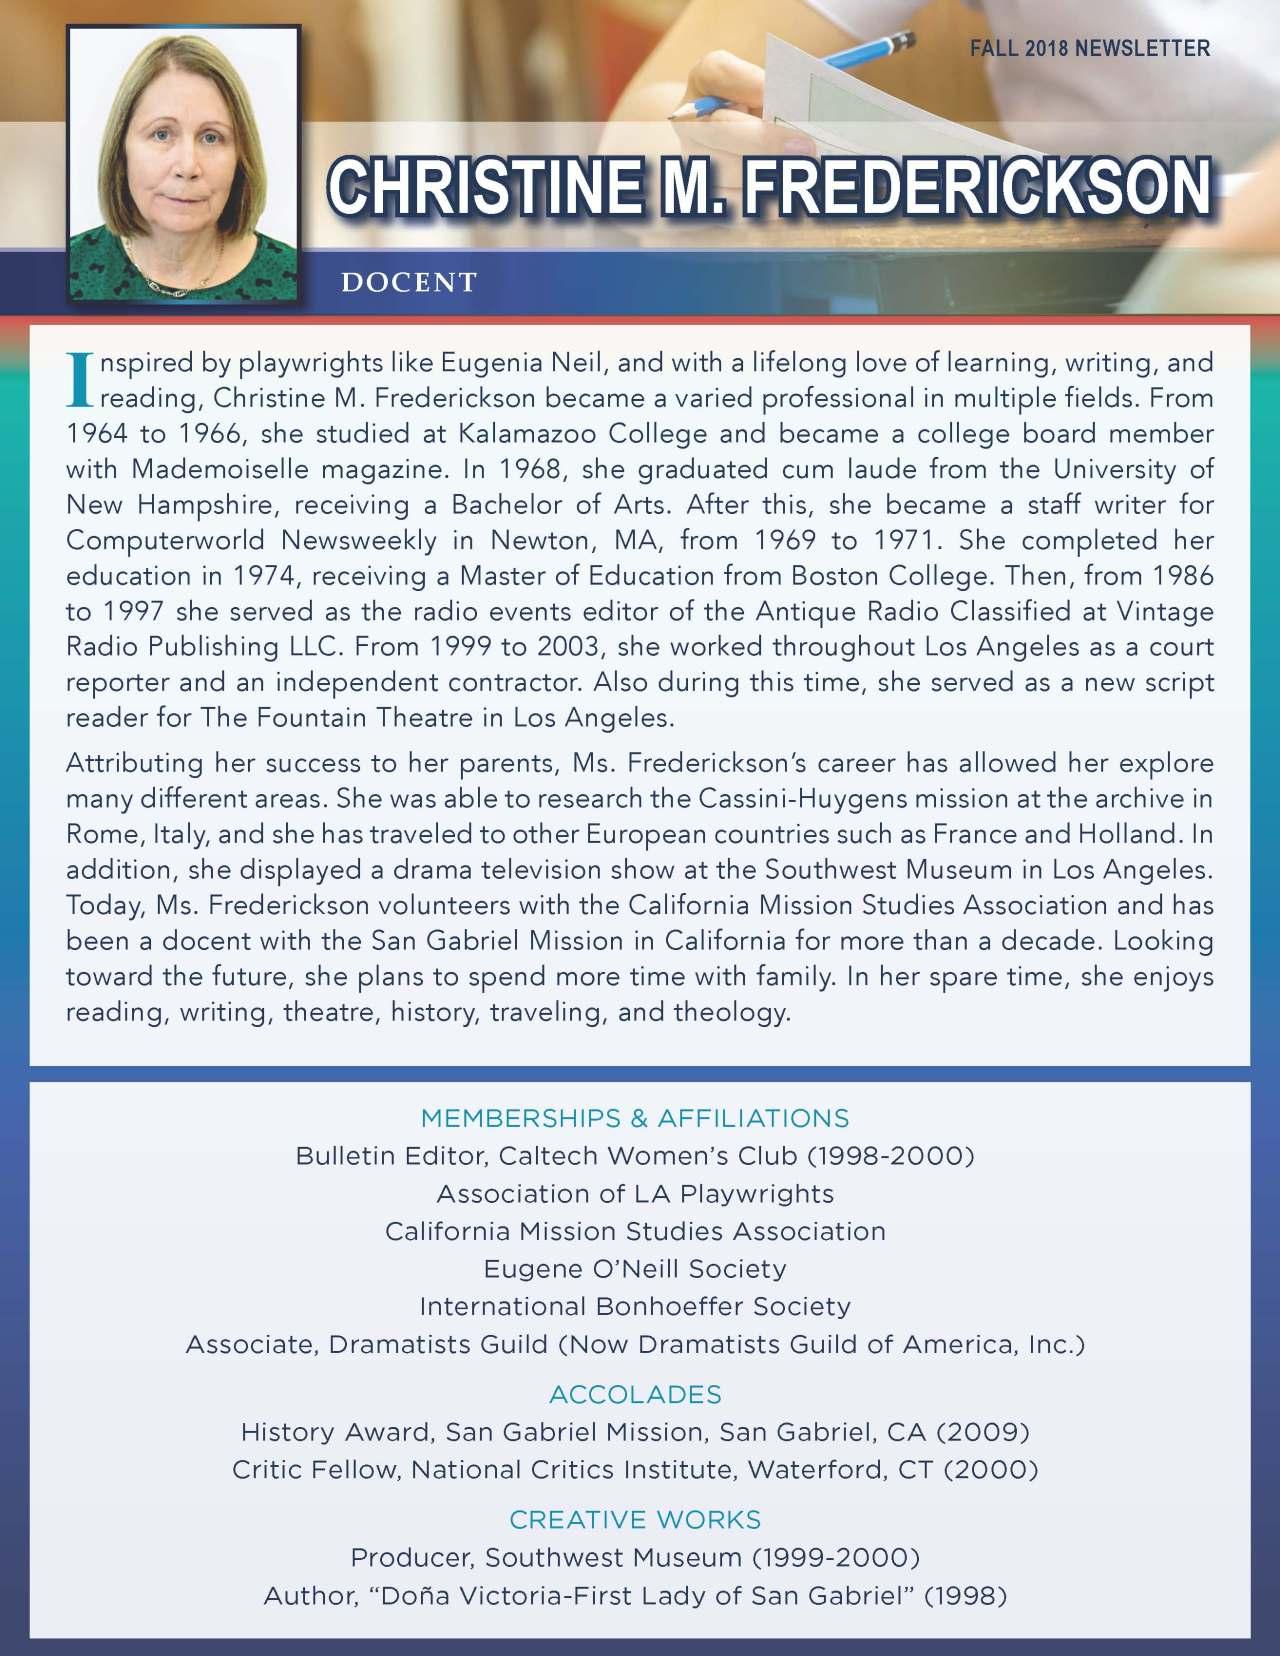 Frederickson, Christine 2163454_31447425 Newsletter